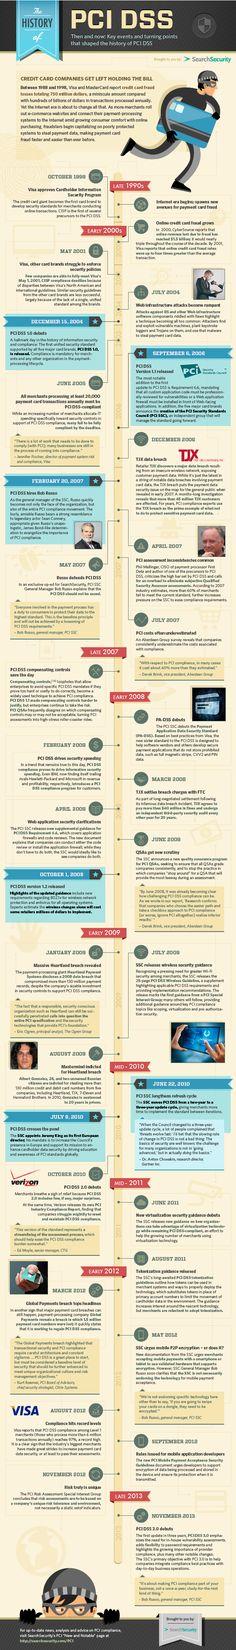 PCI DSS Timeline (History of)